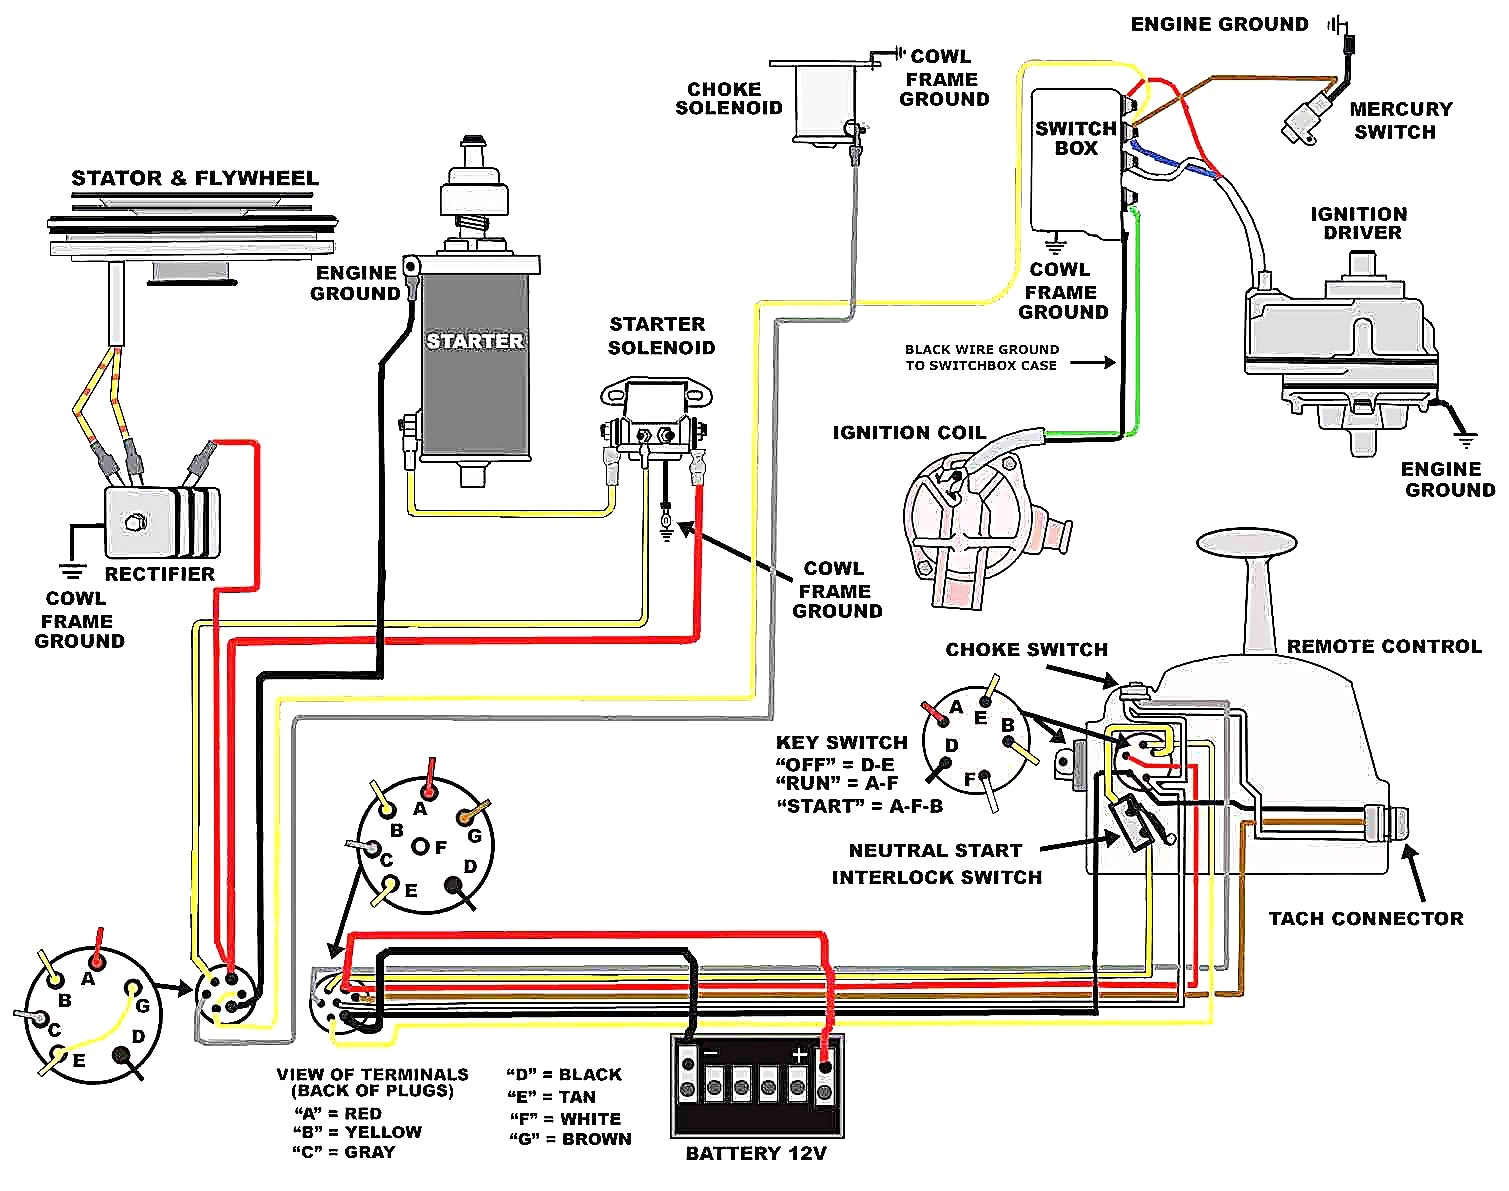 omc 4 3 wiring diagram wiring diagram operations omc trolling motor wiring diagrams omc 4 3